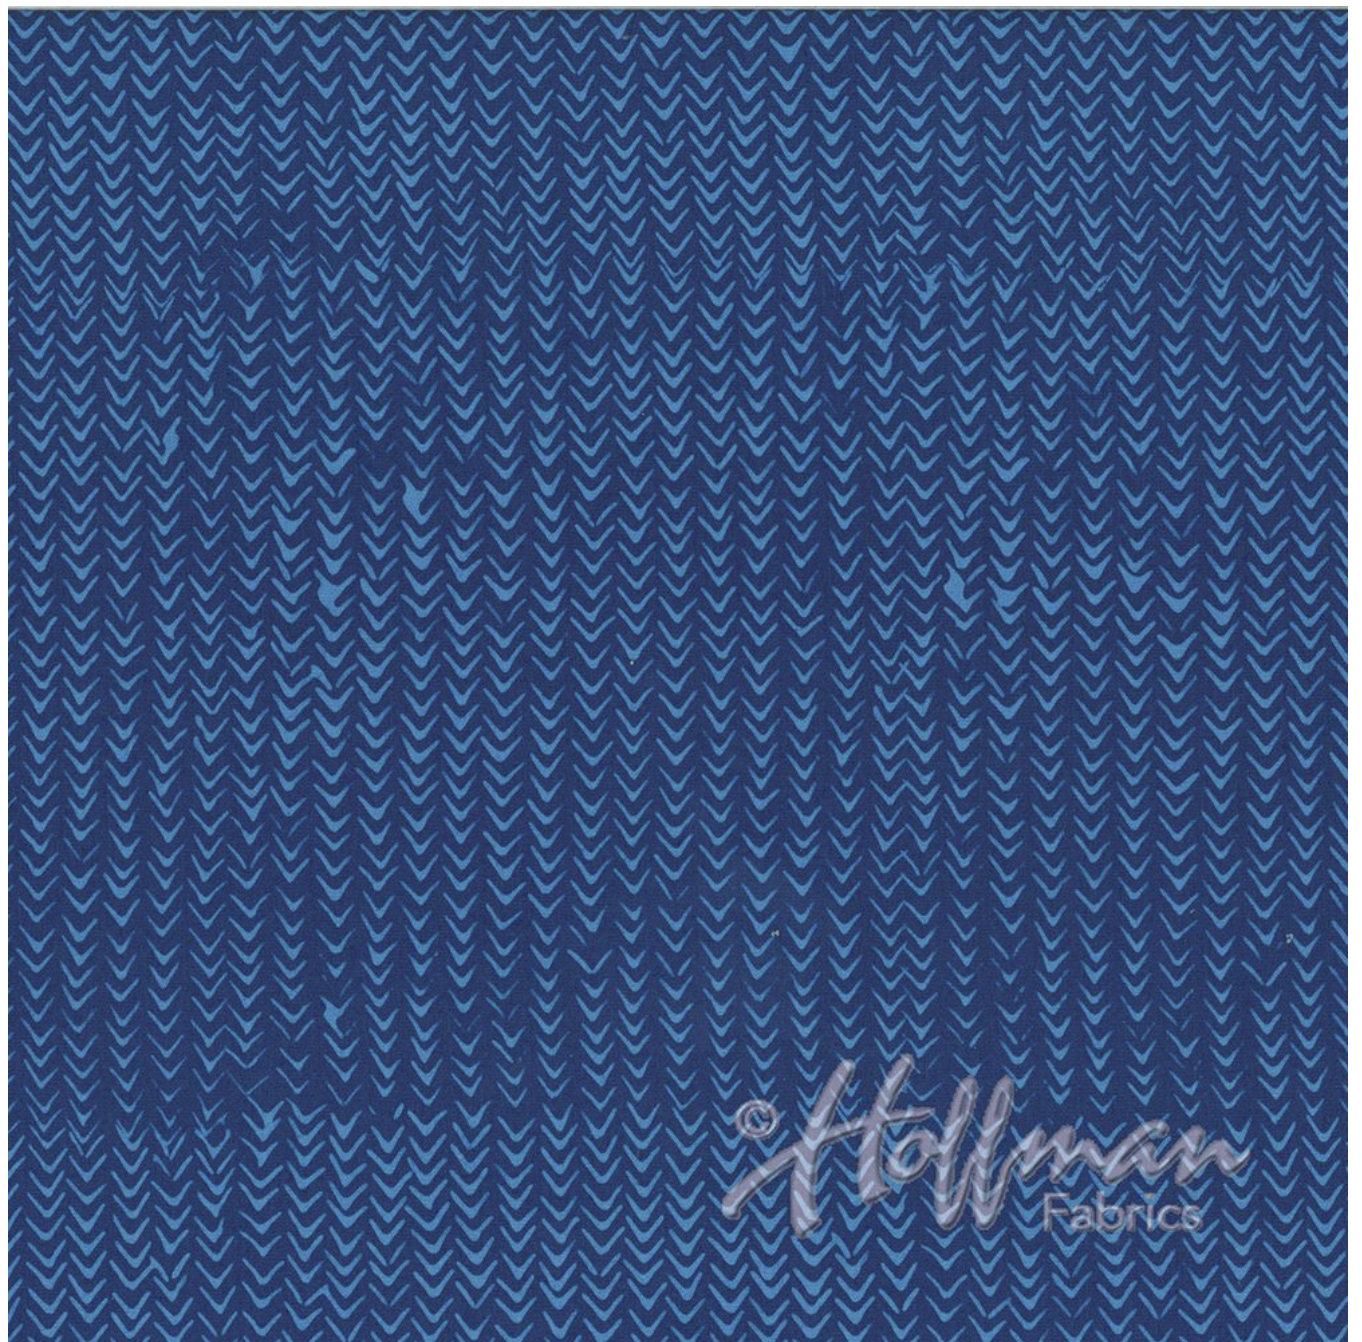 Arrows Iris - Hand Dyed Batiks - Me + You Hoffman Fabrics 128-40